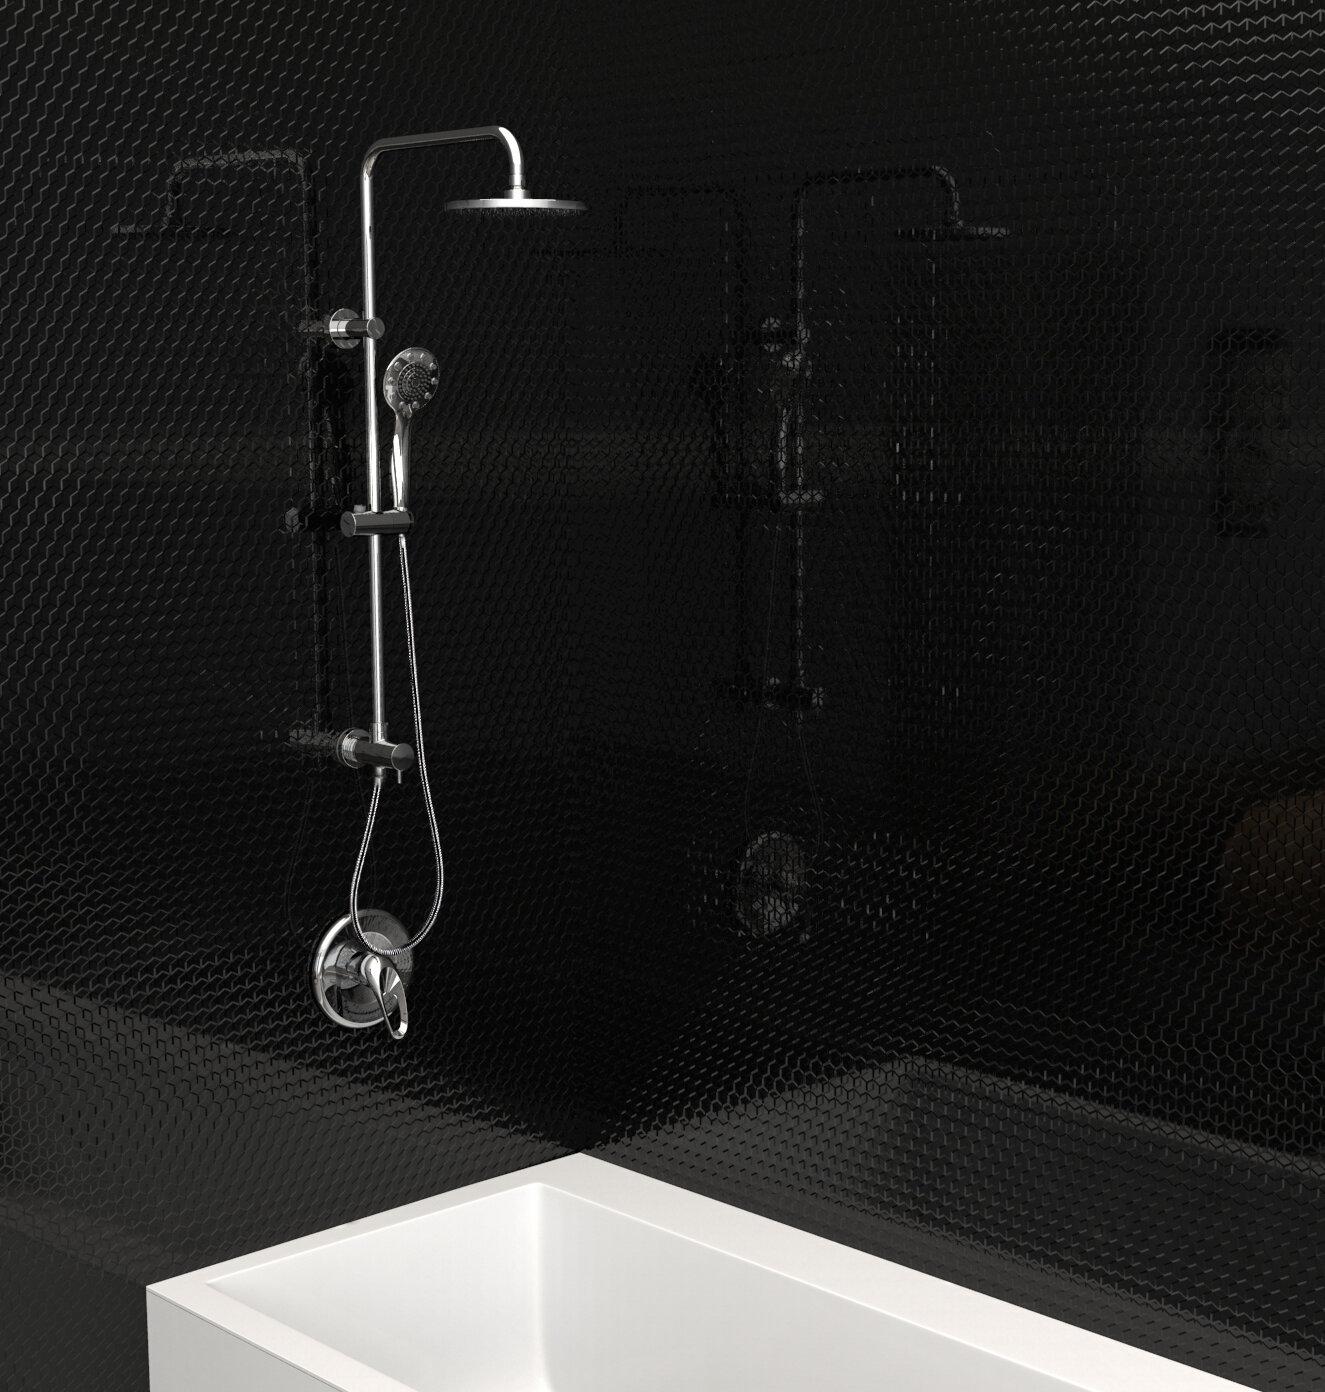 Keeney Manufacturing Company Retrofit Shower Faucet Diverter Complete Shower System Reviews Wayfair